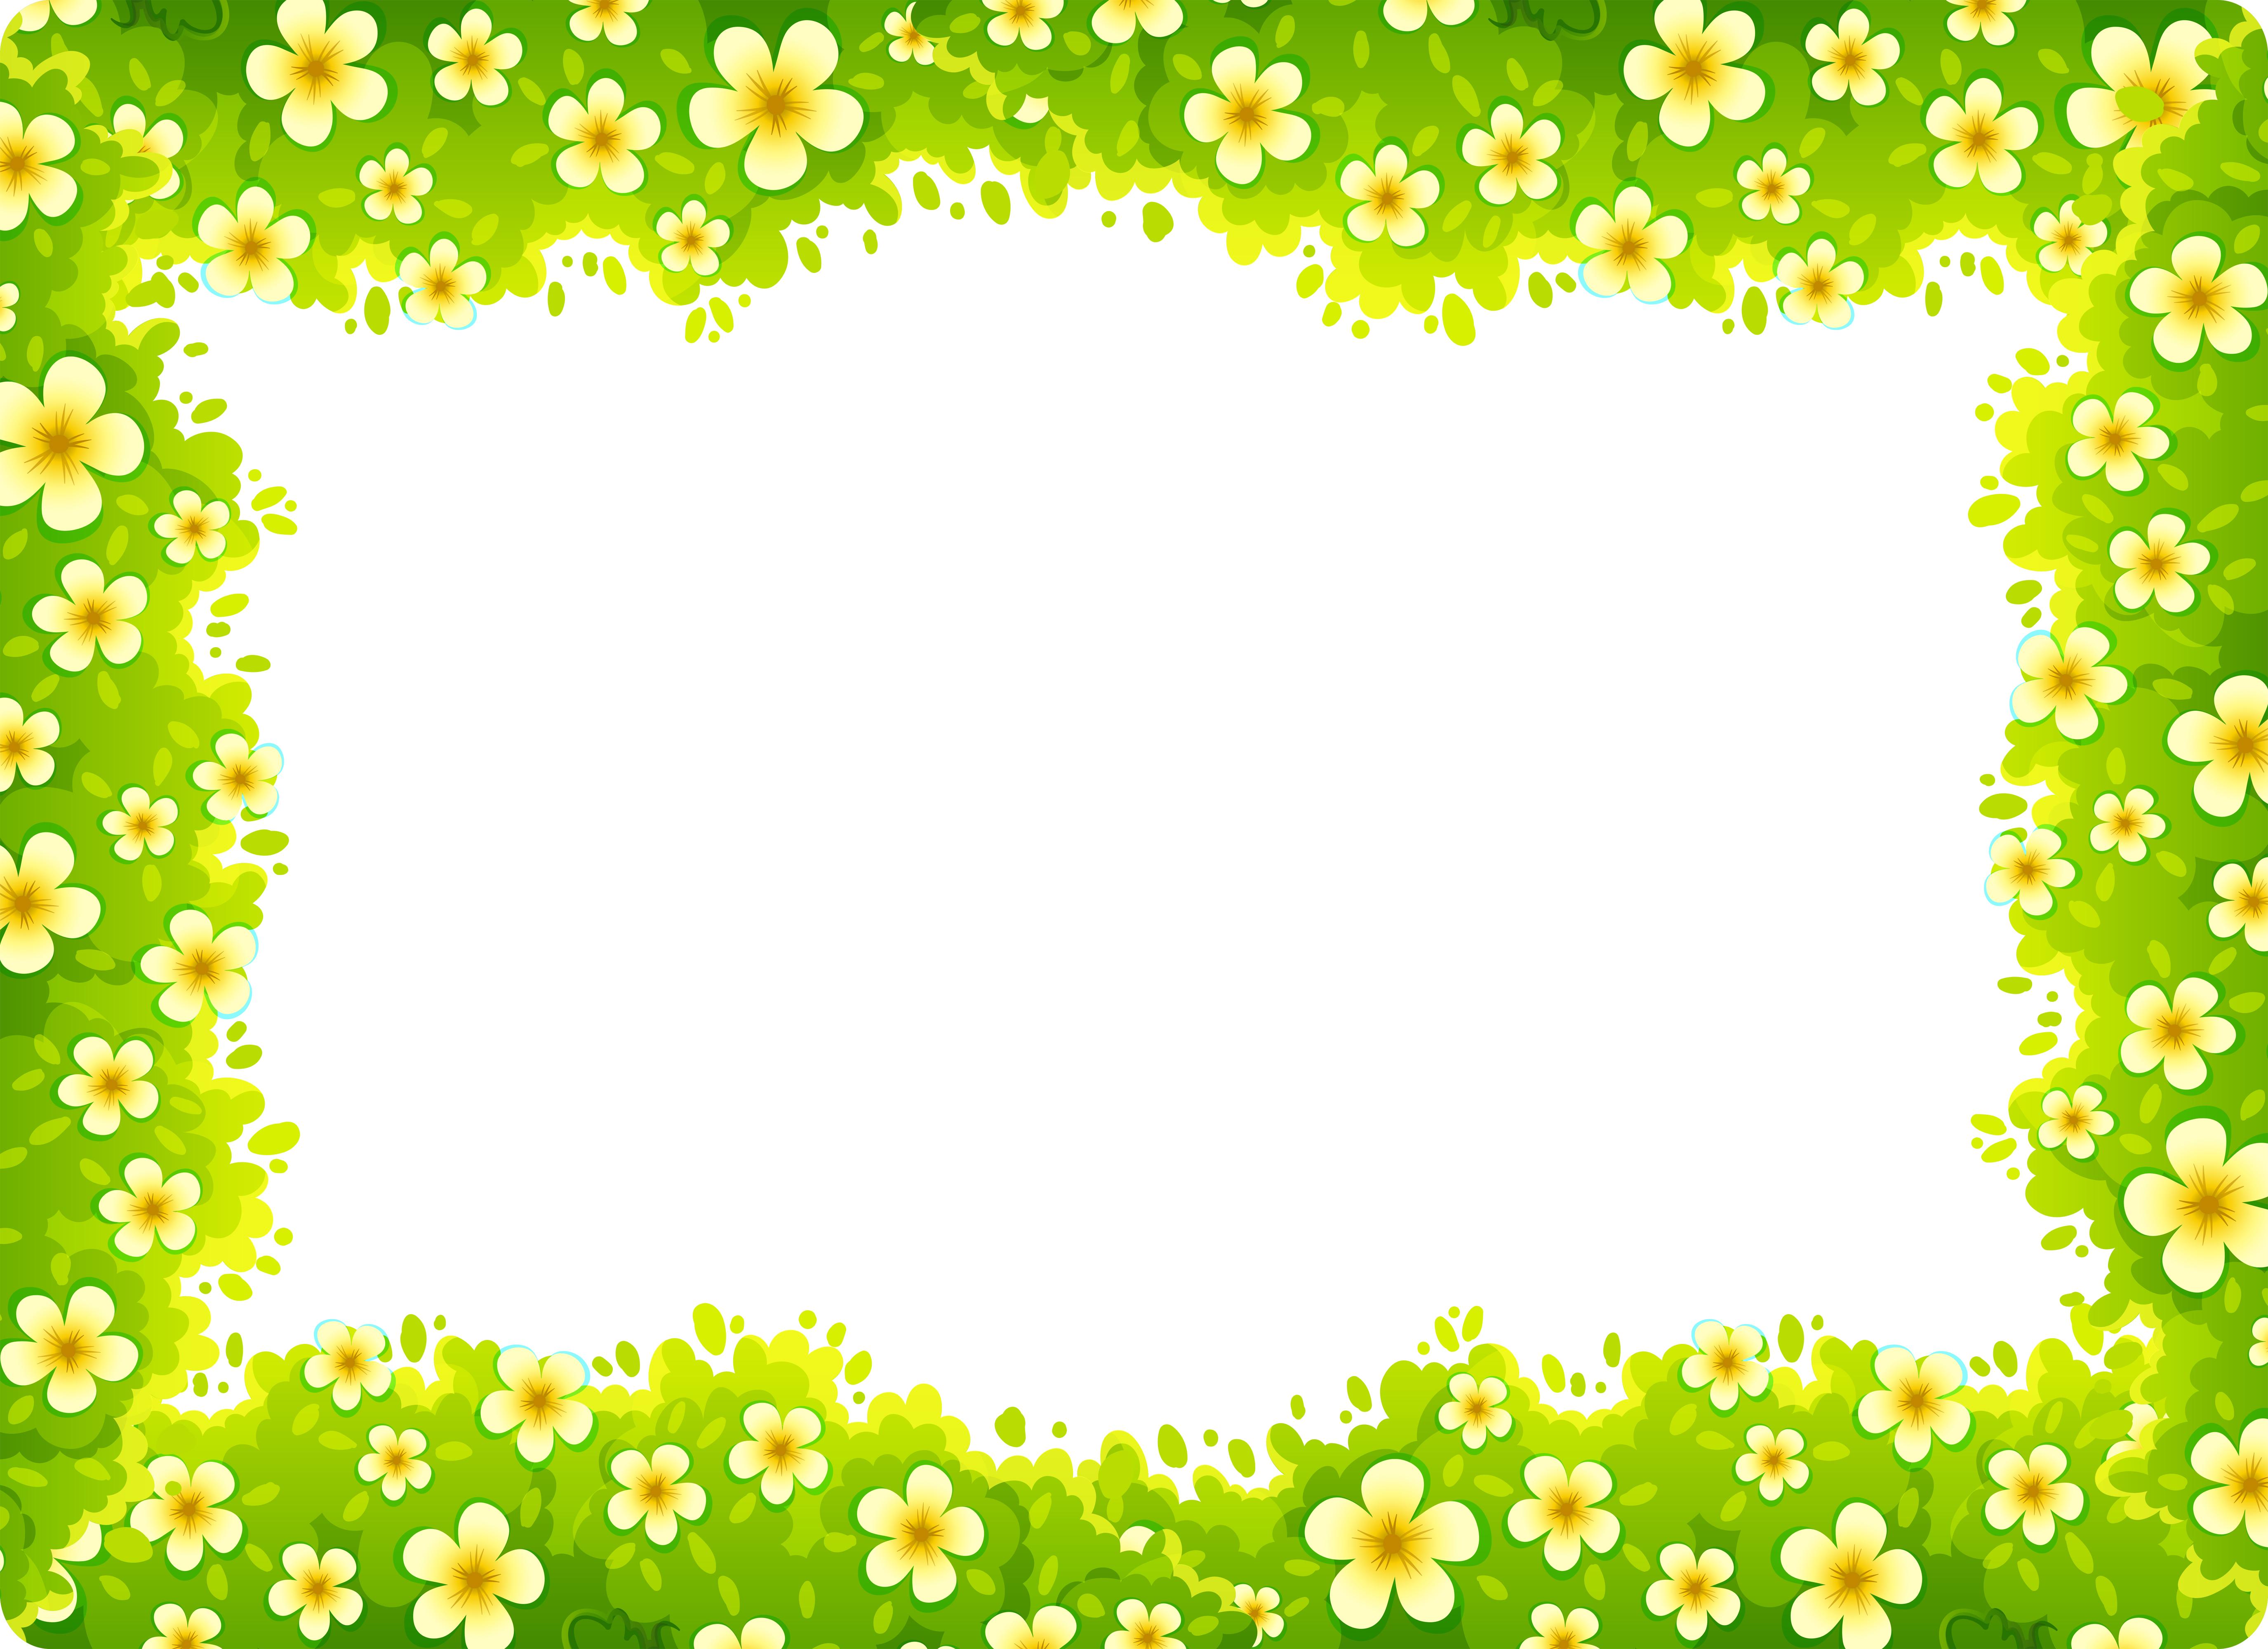 daisy nature frame concept download free vectors clipart graphics vector art vecteezy